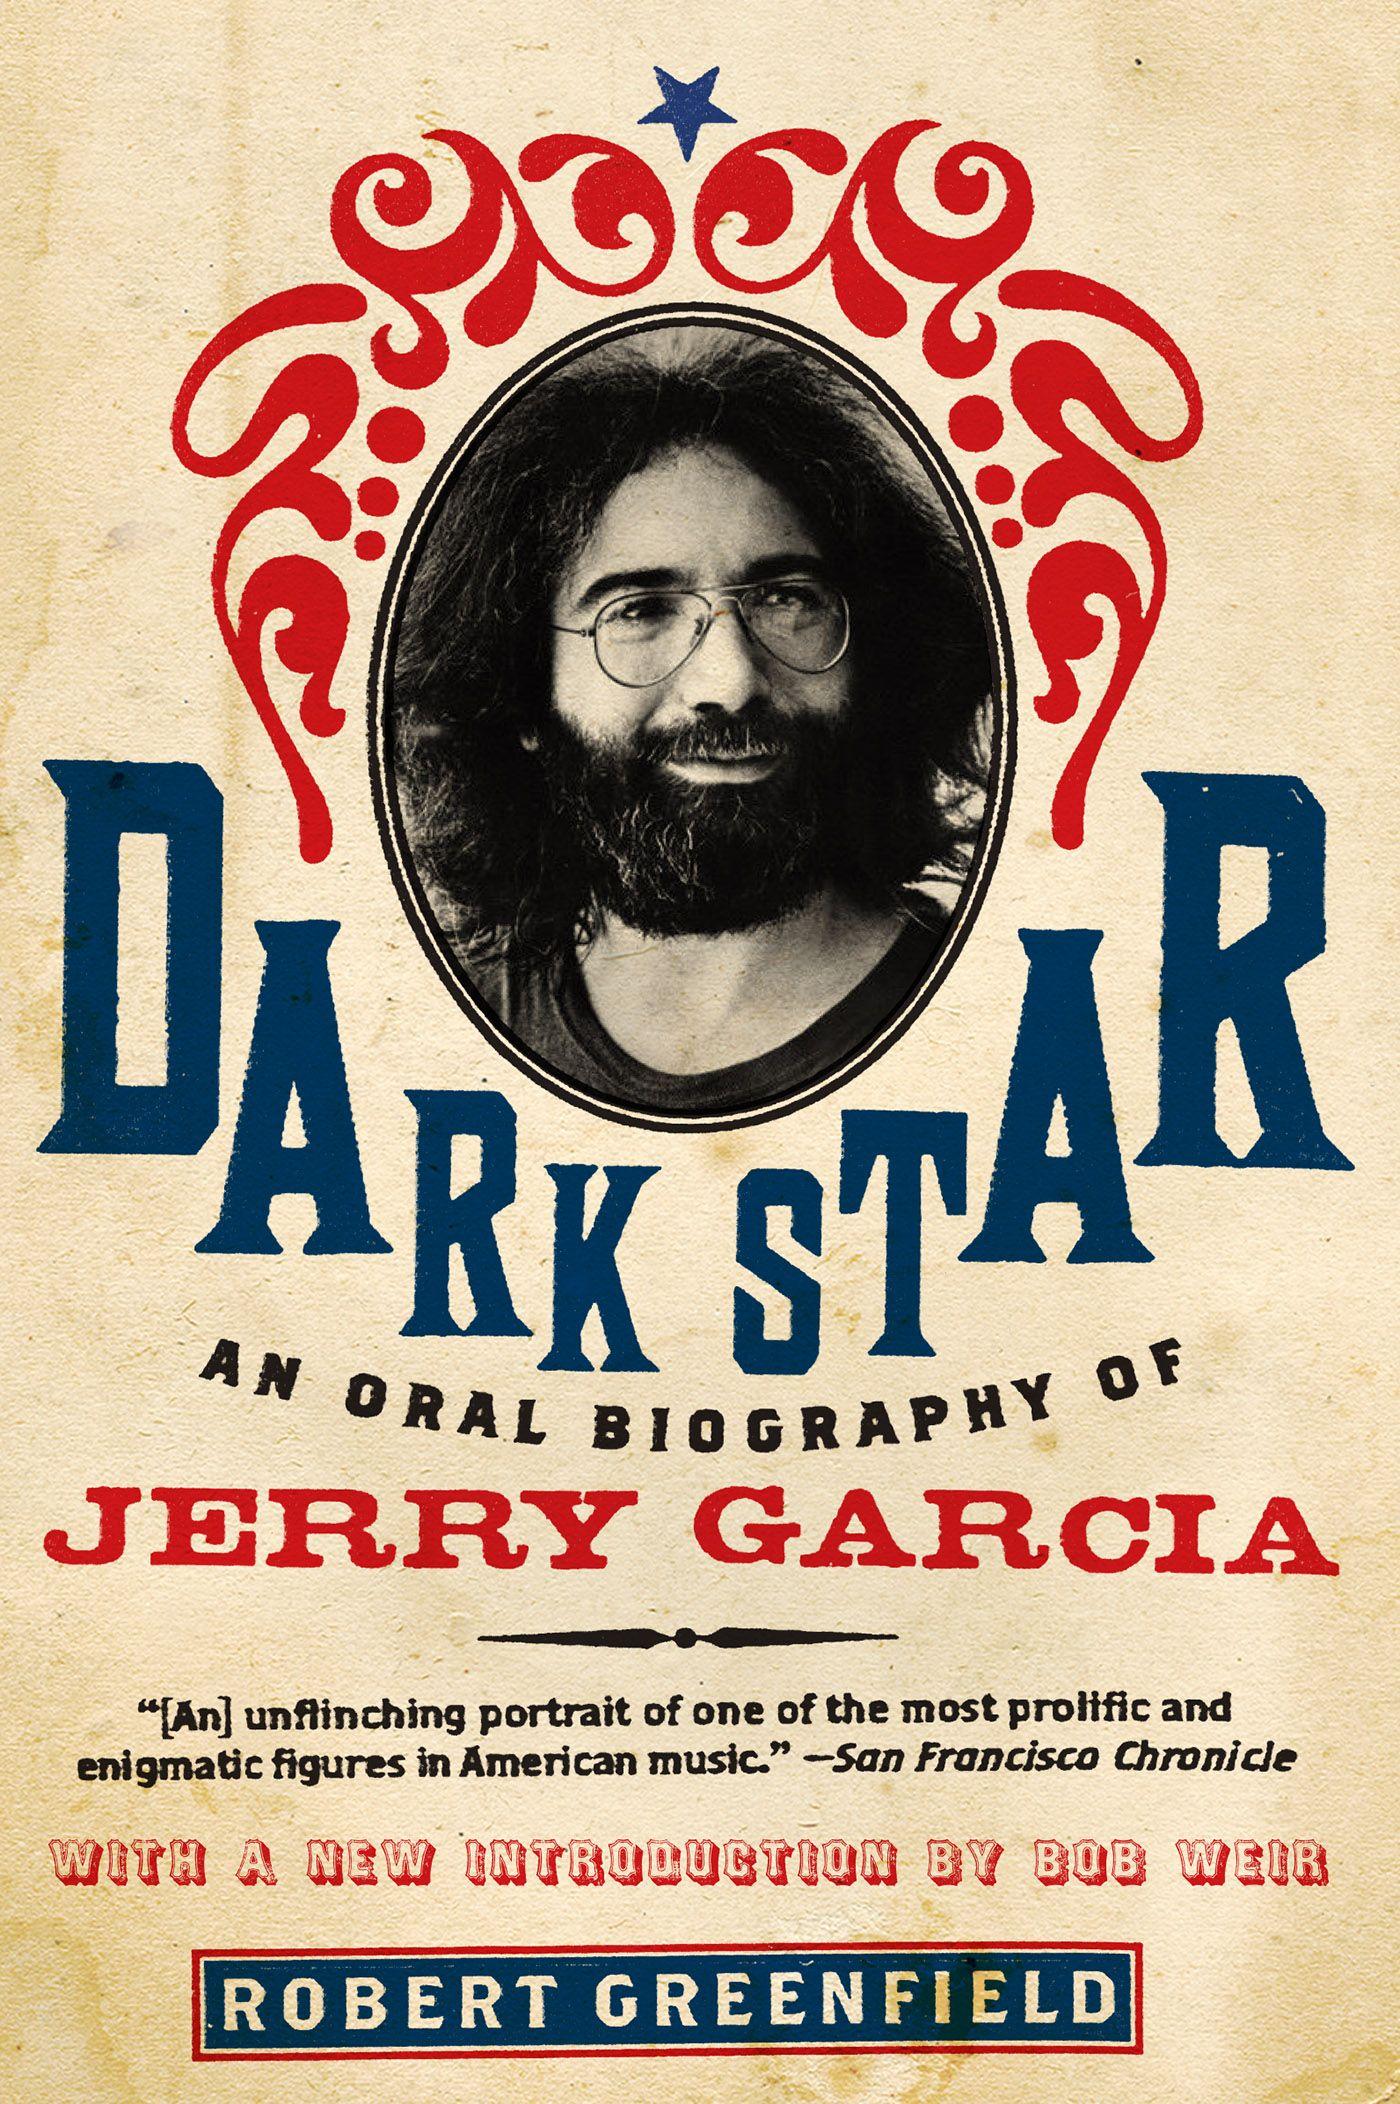 Dark star an oral biography of jerry garcia in 2020